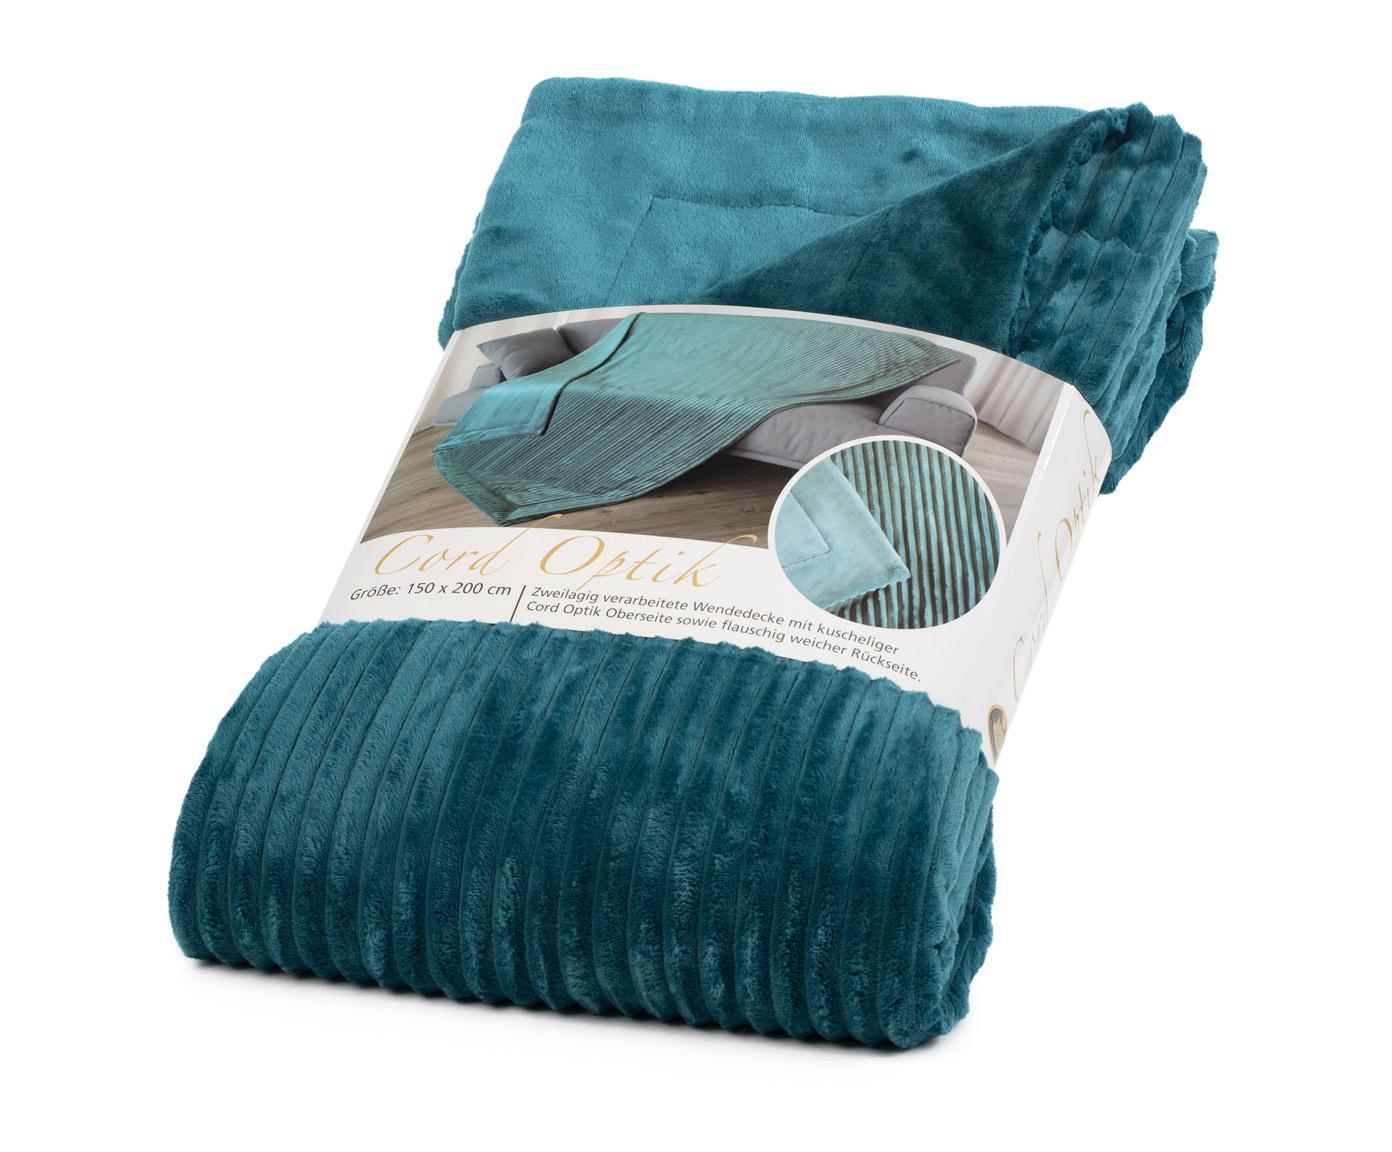 Blankets Cord Optik 150x200 petrol